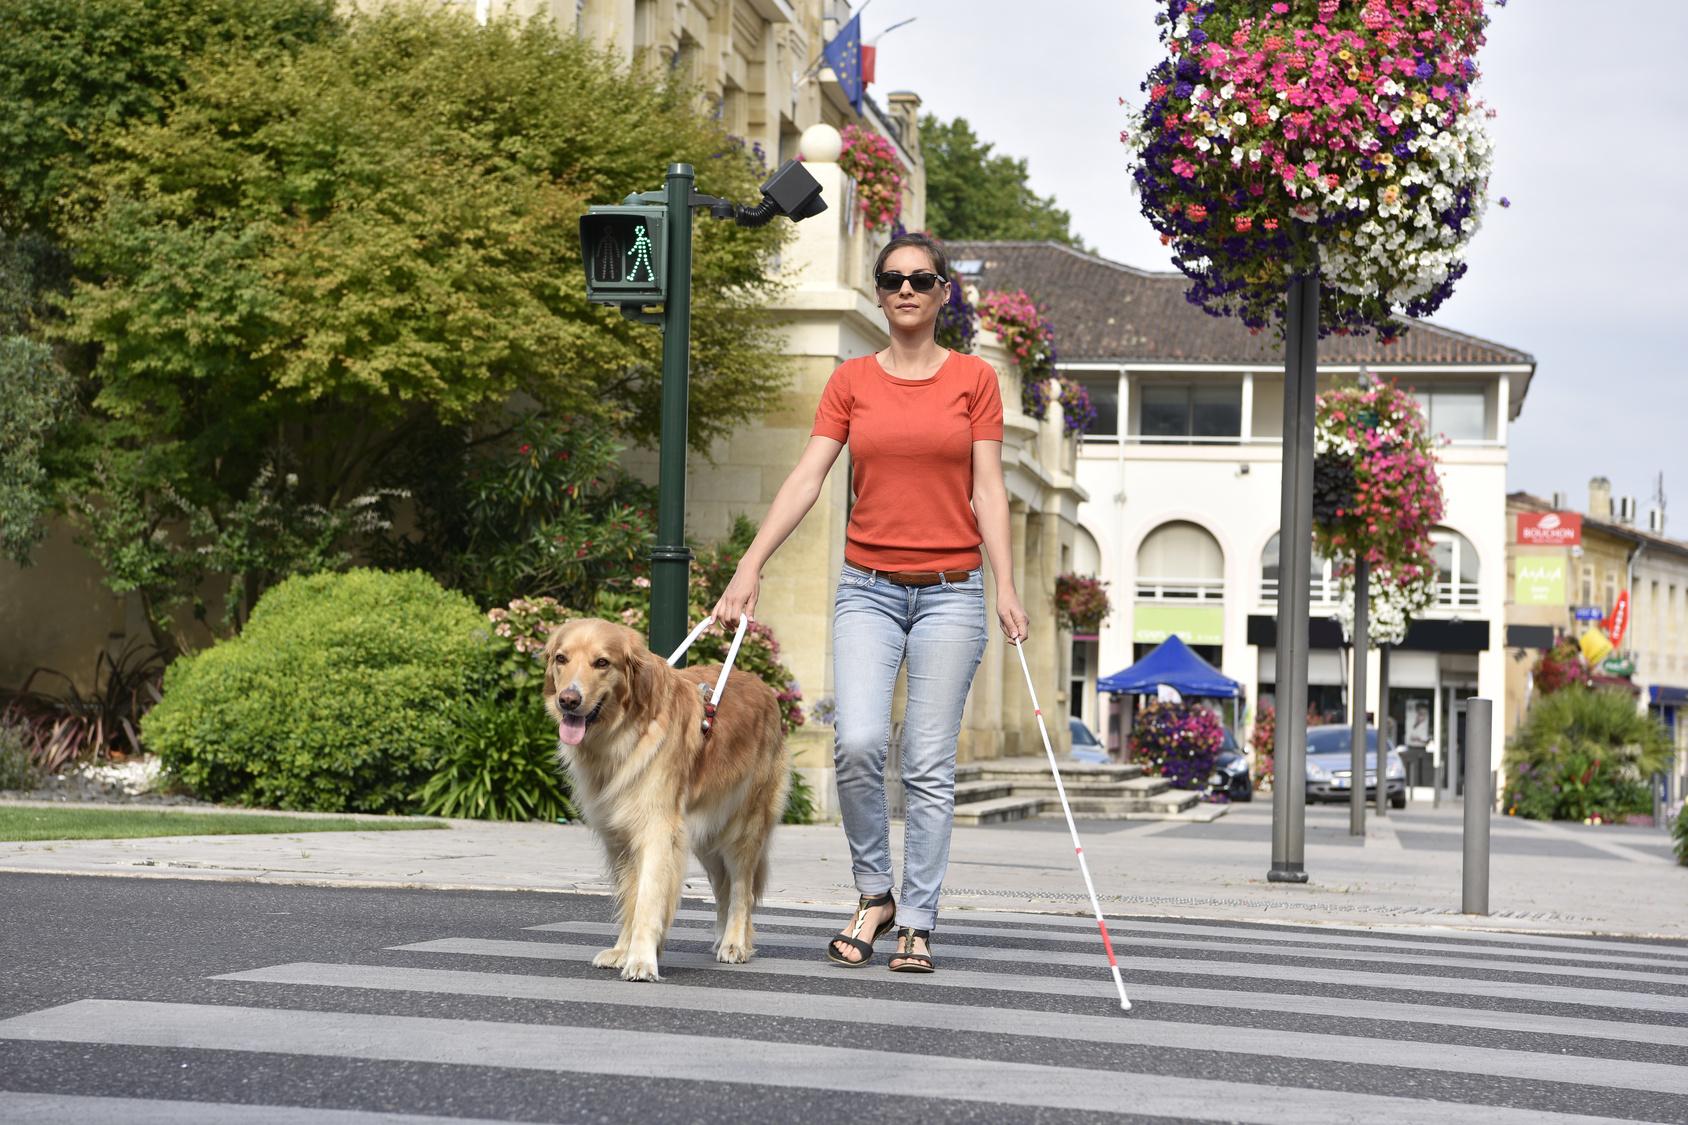 Frau täuscht 28 Jahre lang Blindheit vor